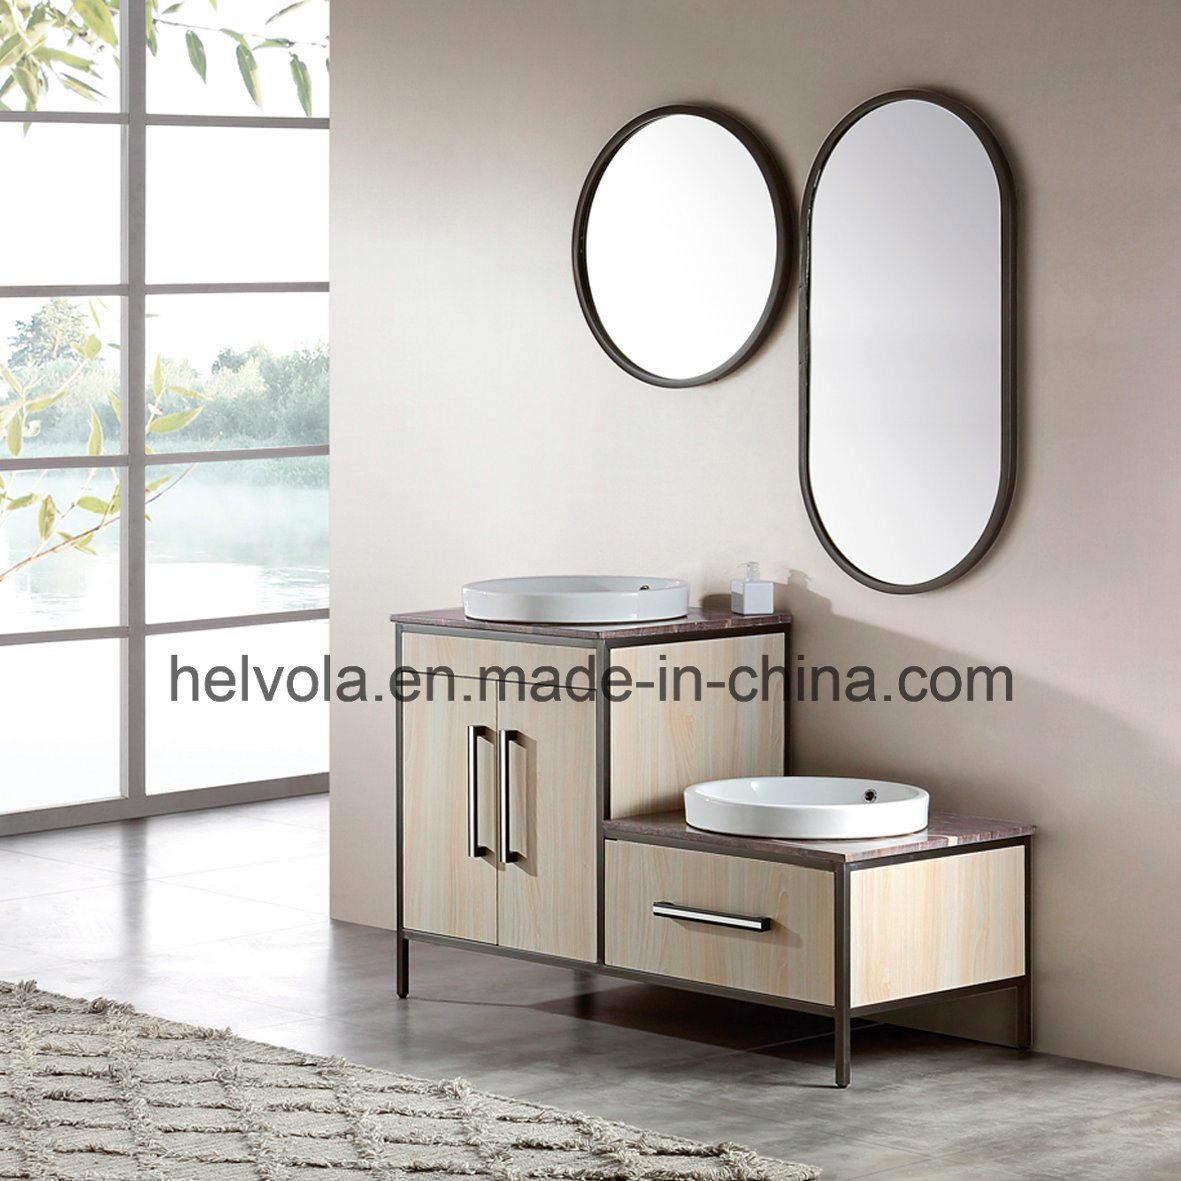 China 7 Sanitary Ware Bathroom Basin Accessories Cabinet Bathroom ...